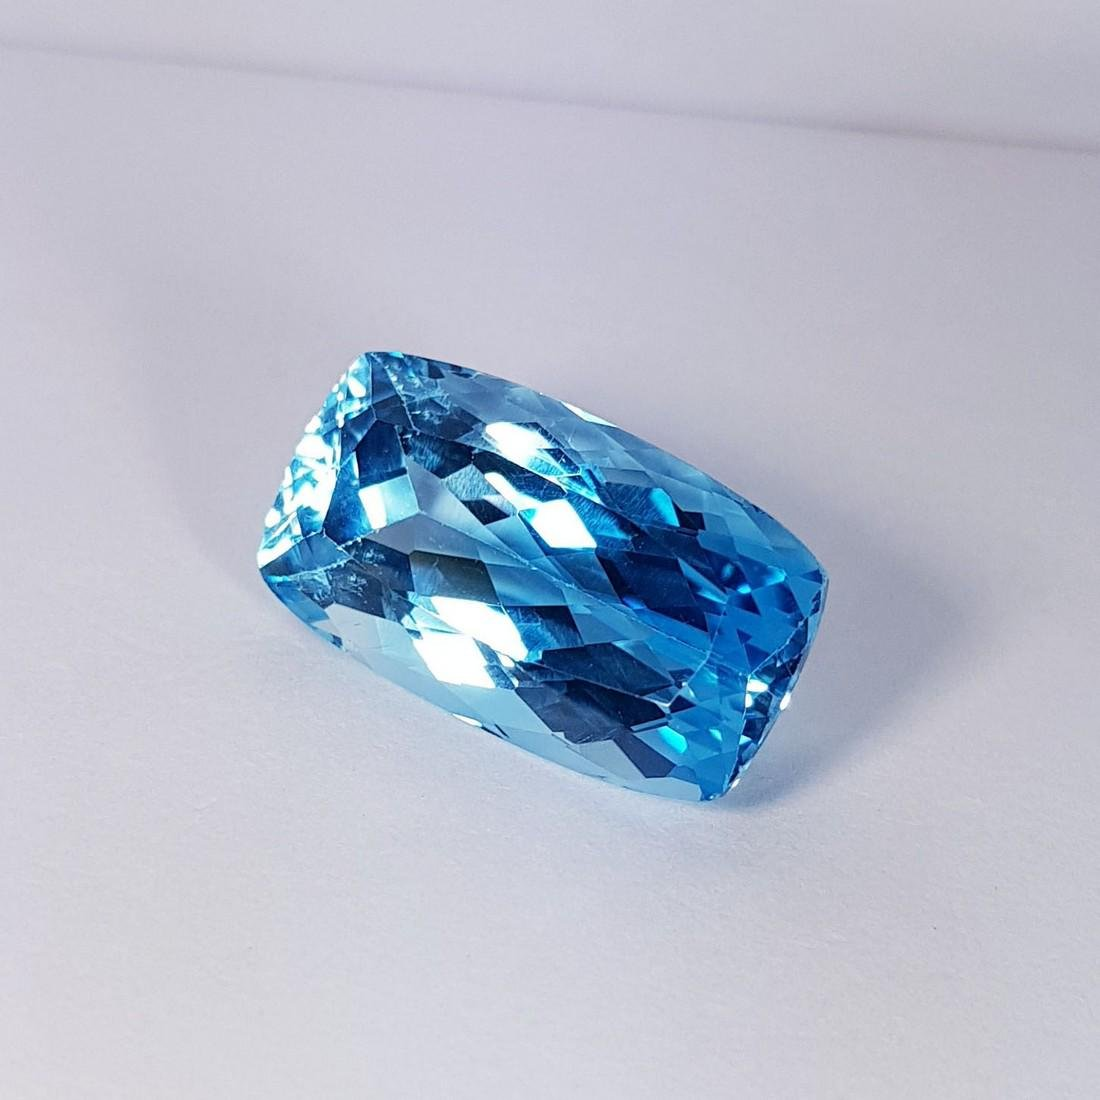 Natural Swiss Blue Topaz - 24.25 ct - 3